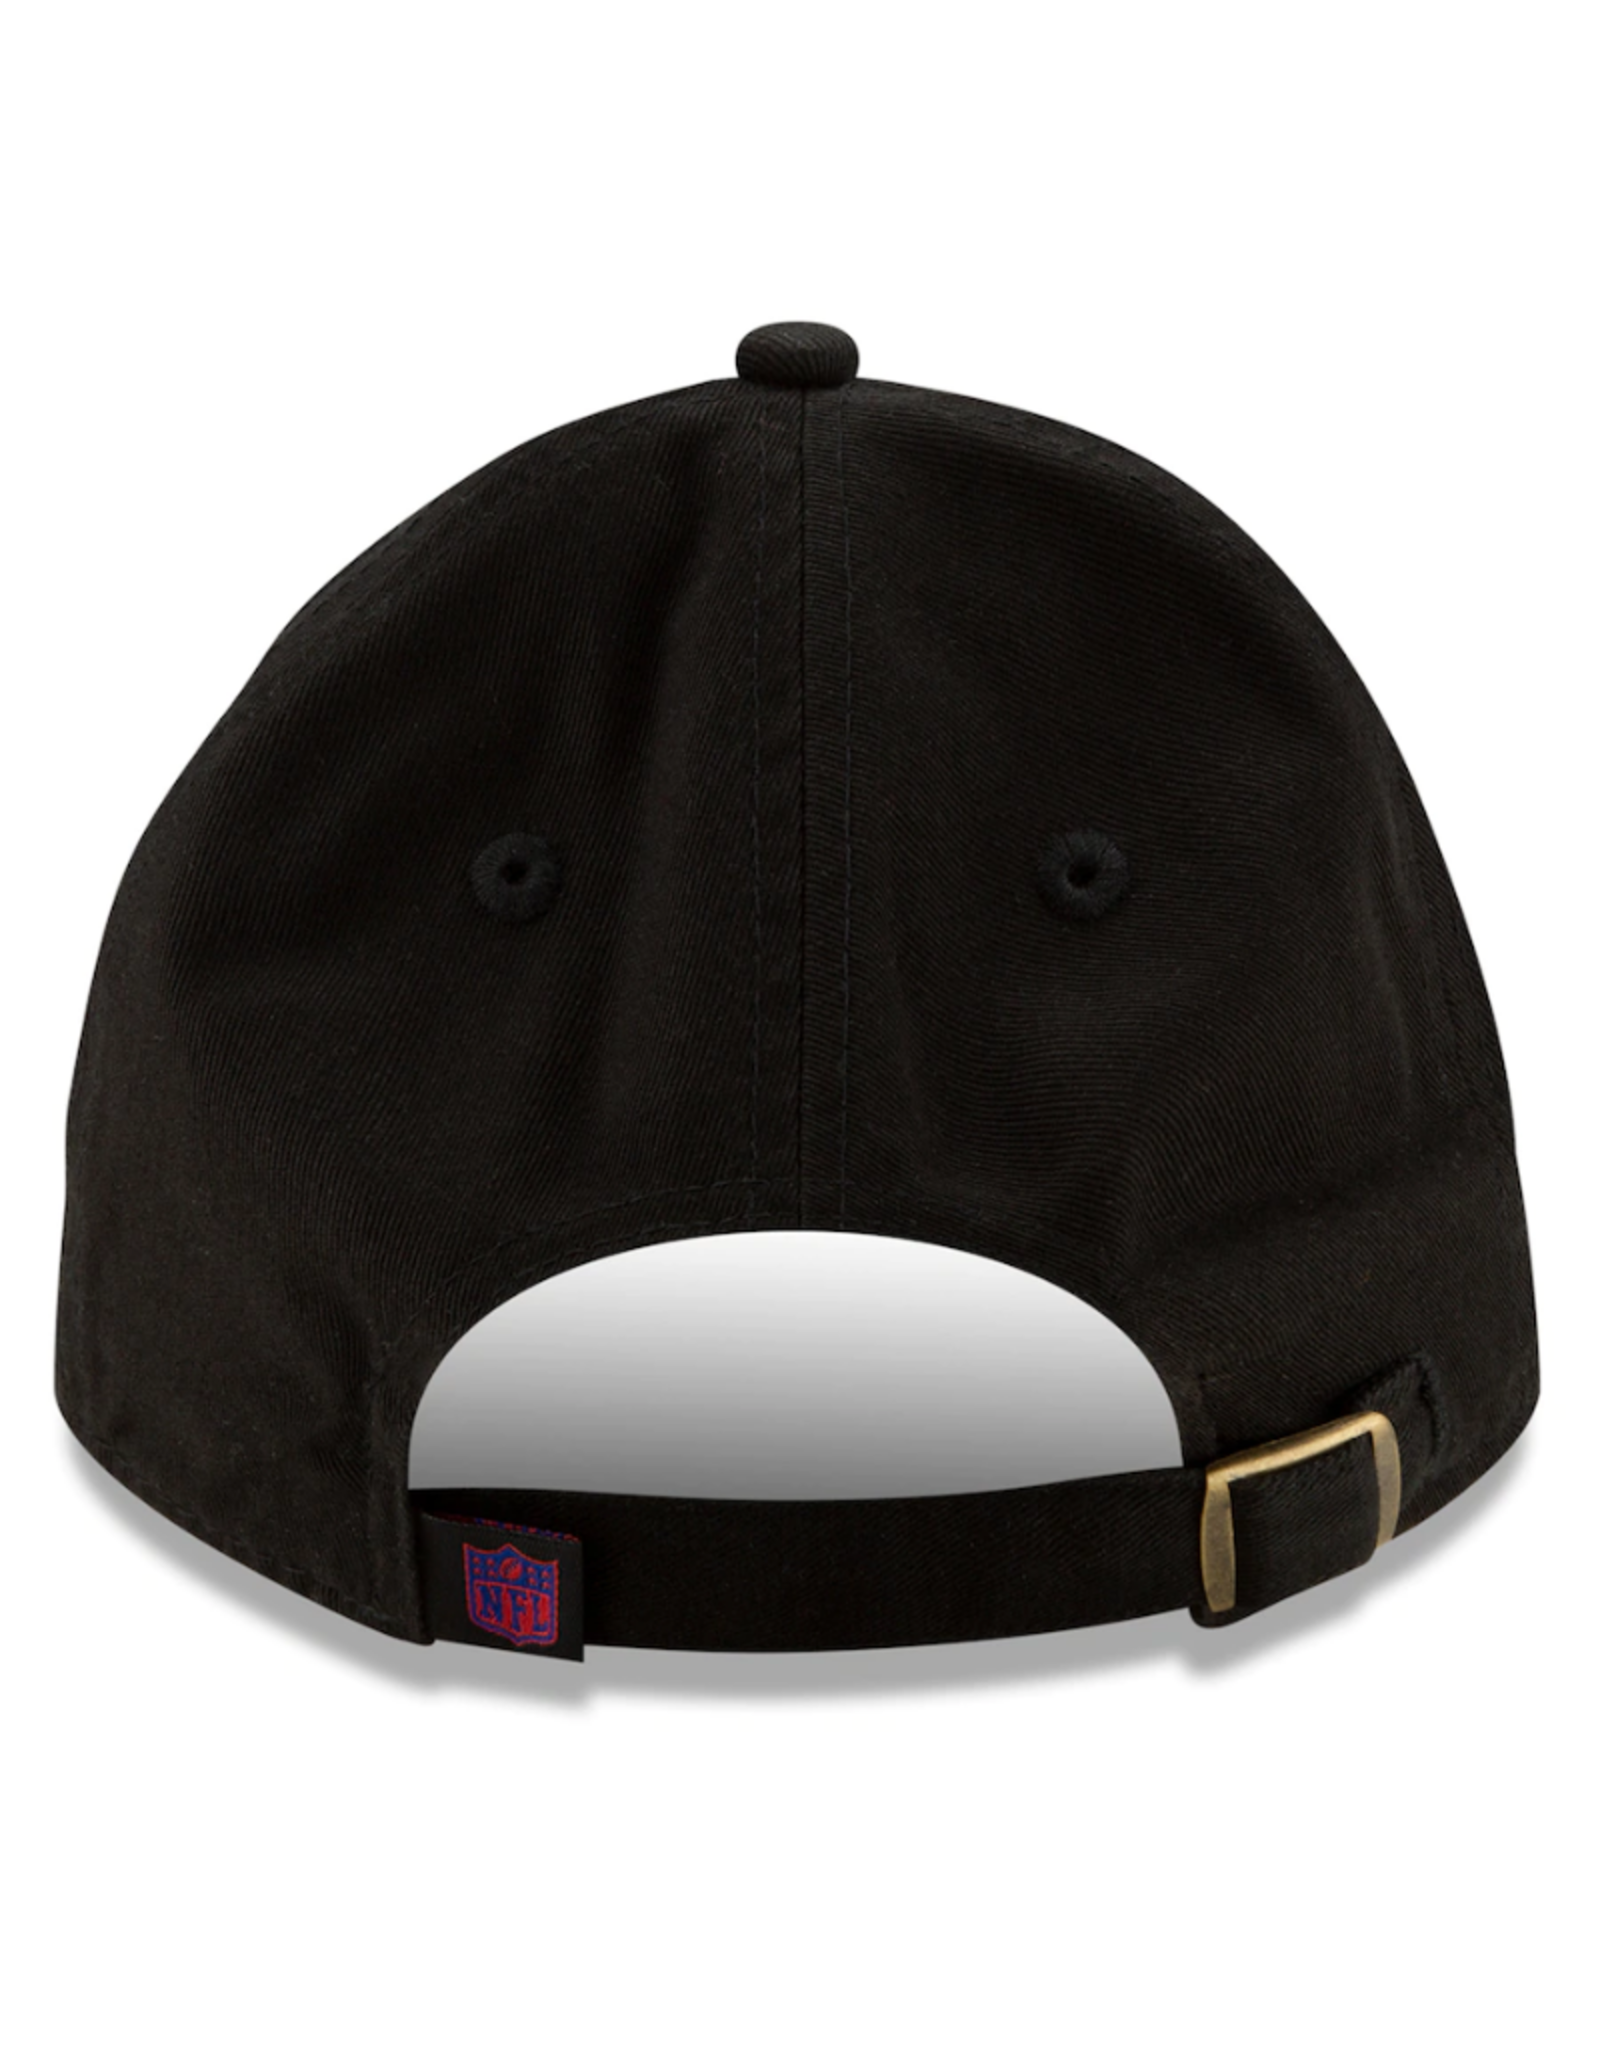 New Era '20 NFL Draft Casual Classic Hat New York Giants Black Adjustable